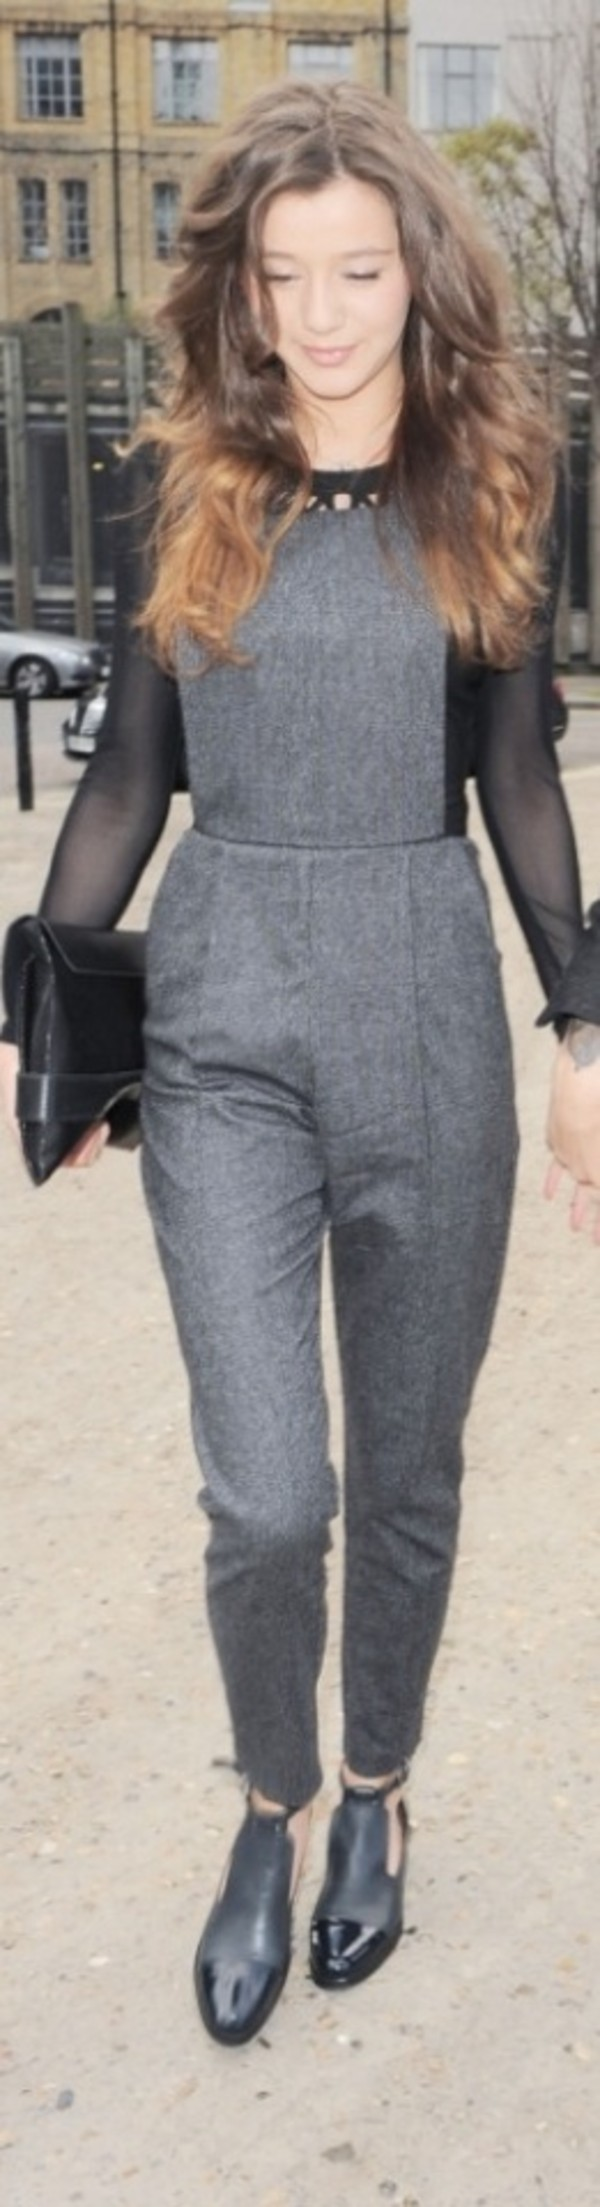 pants eleanor calder shirt shoes bag